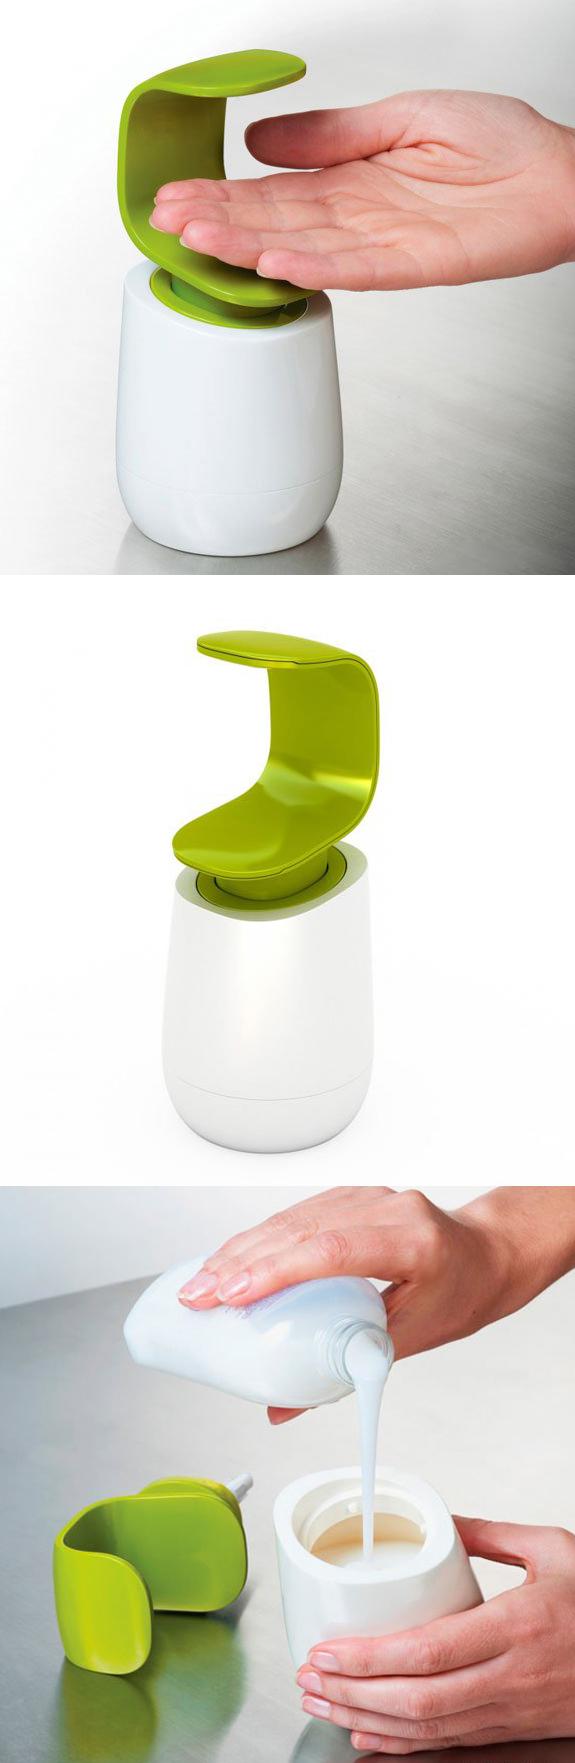 Pin On Smart Designs Homary Com